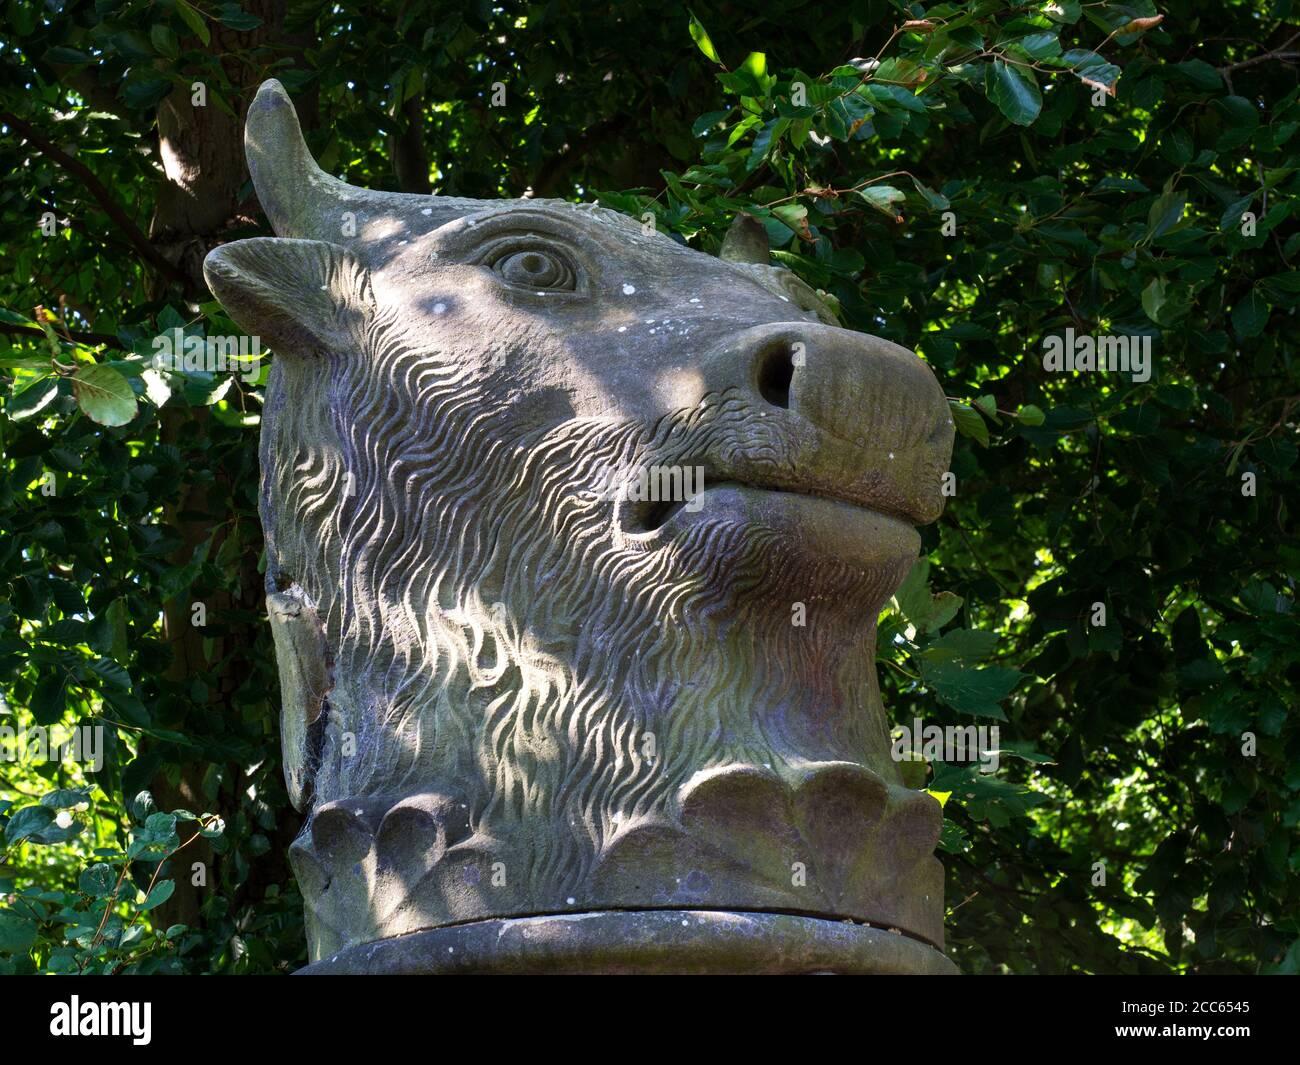 Bulls Head sculpture surmounting a gate pier at the Rudding Dower entrance to Rudding Park Estate near Harrogate North Yorkshire England Stock Photo